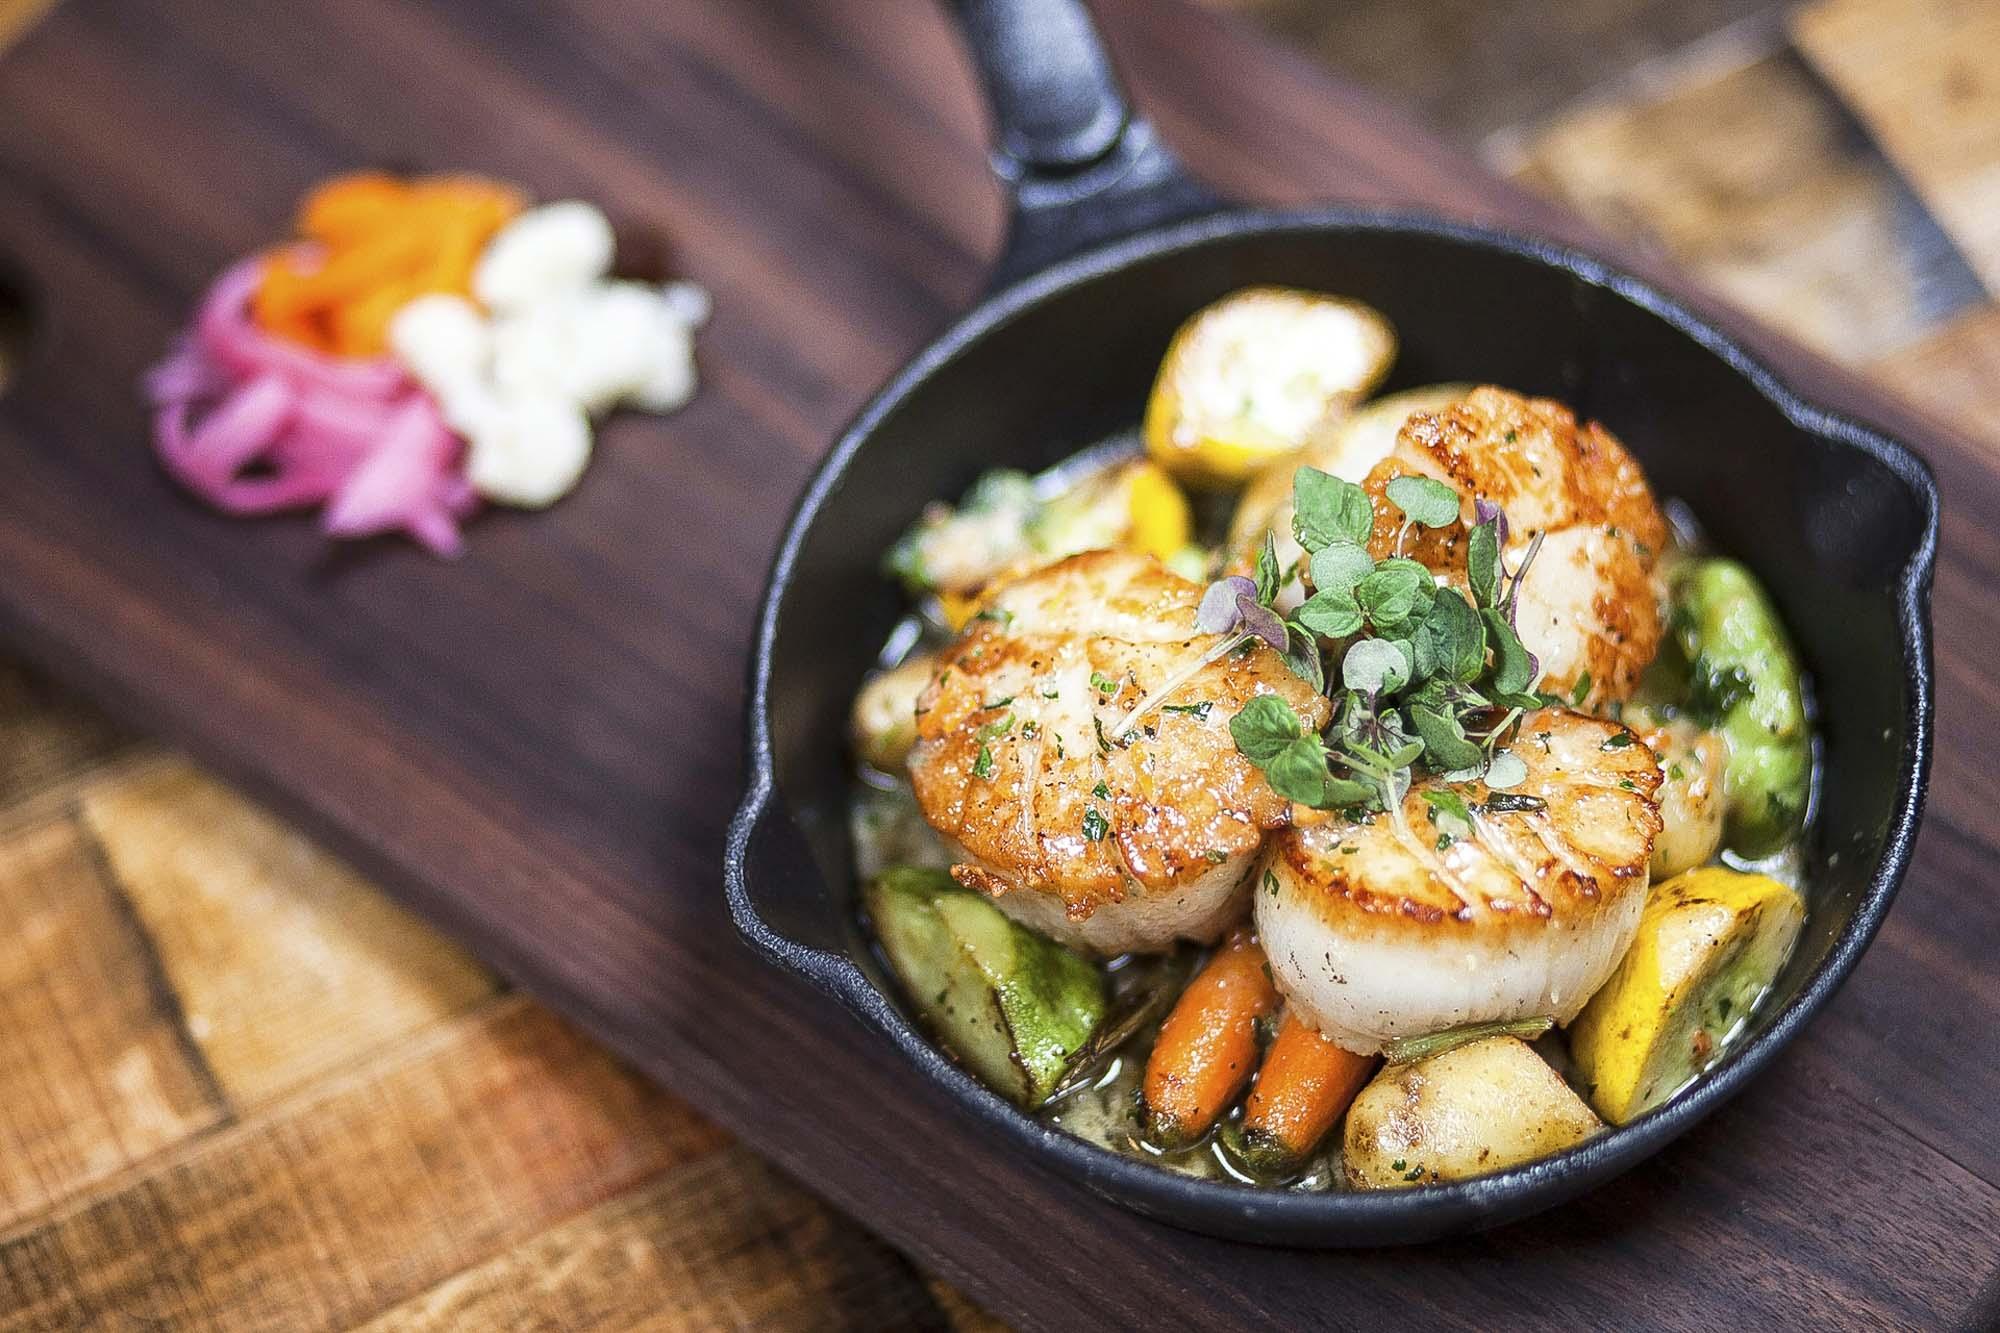 culinaryportfolio-7594.jpg